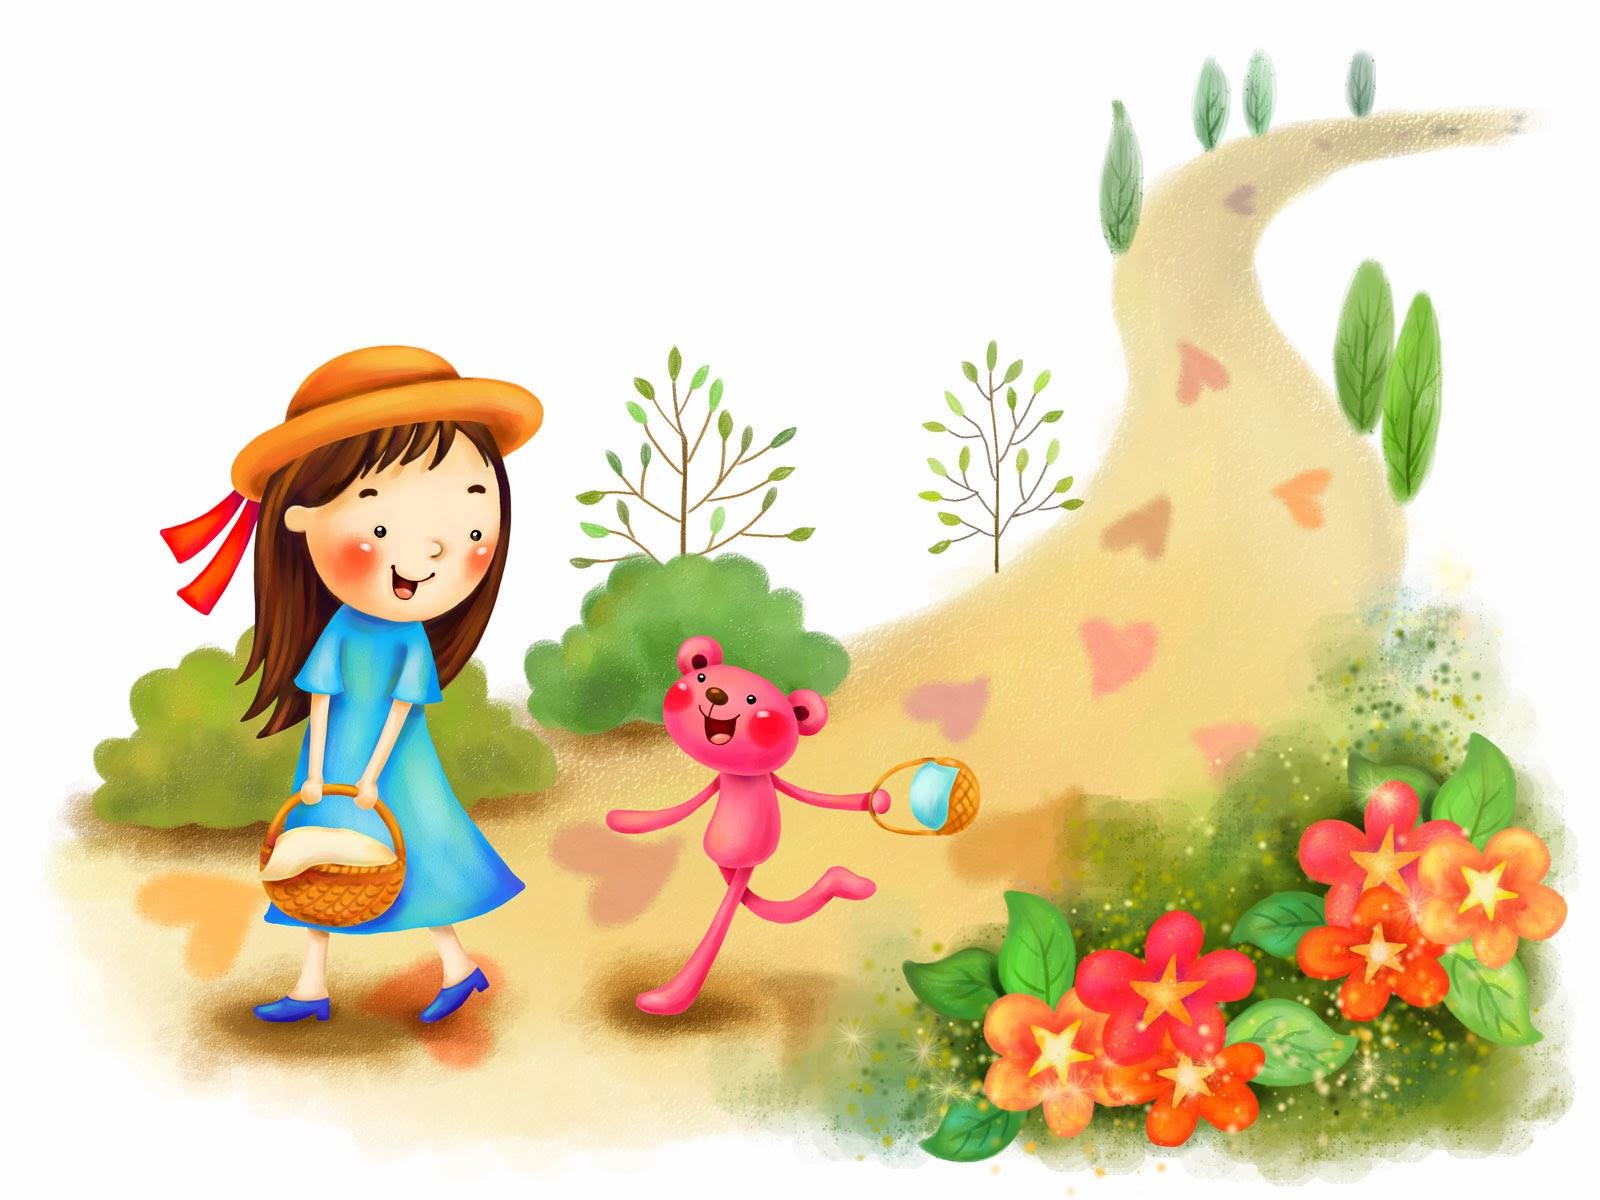 gambar kartun korea cute